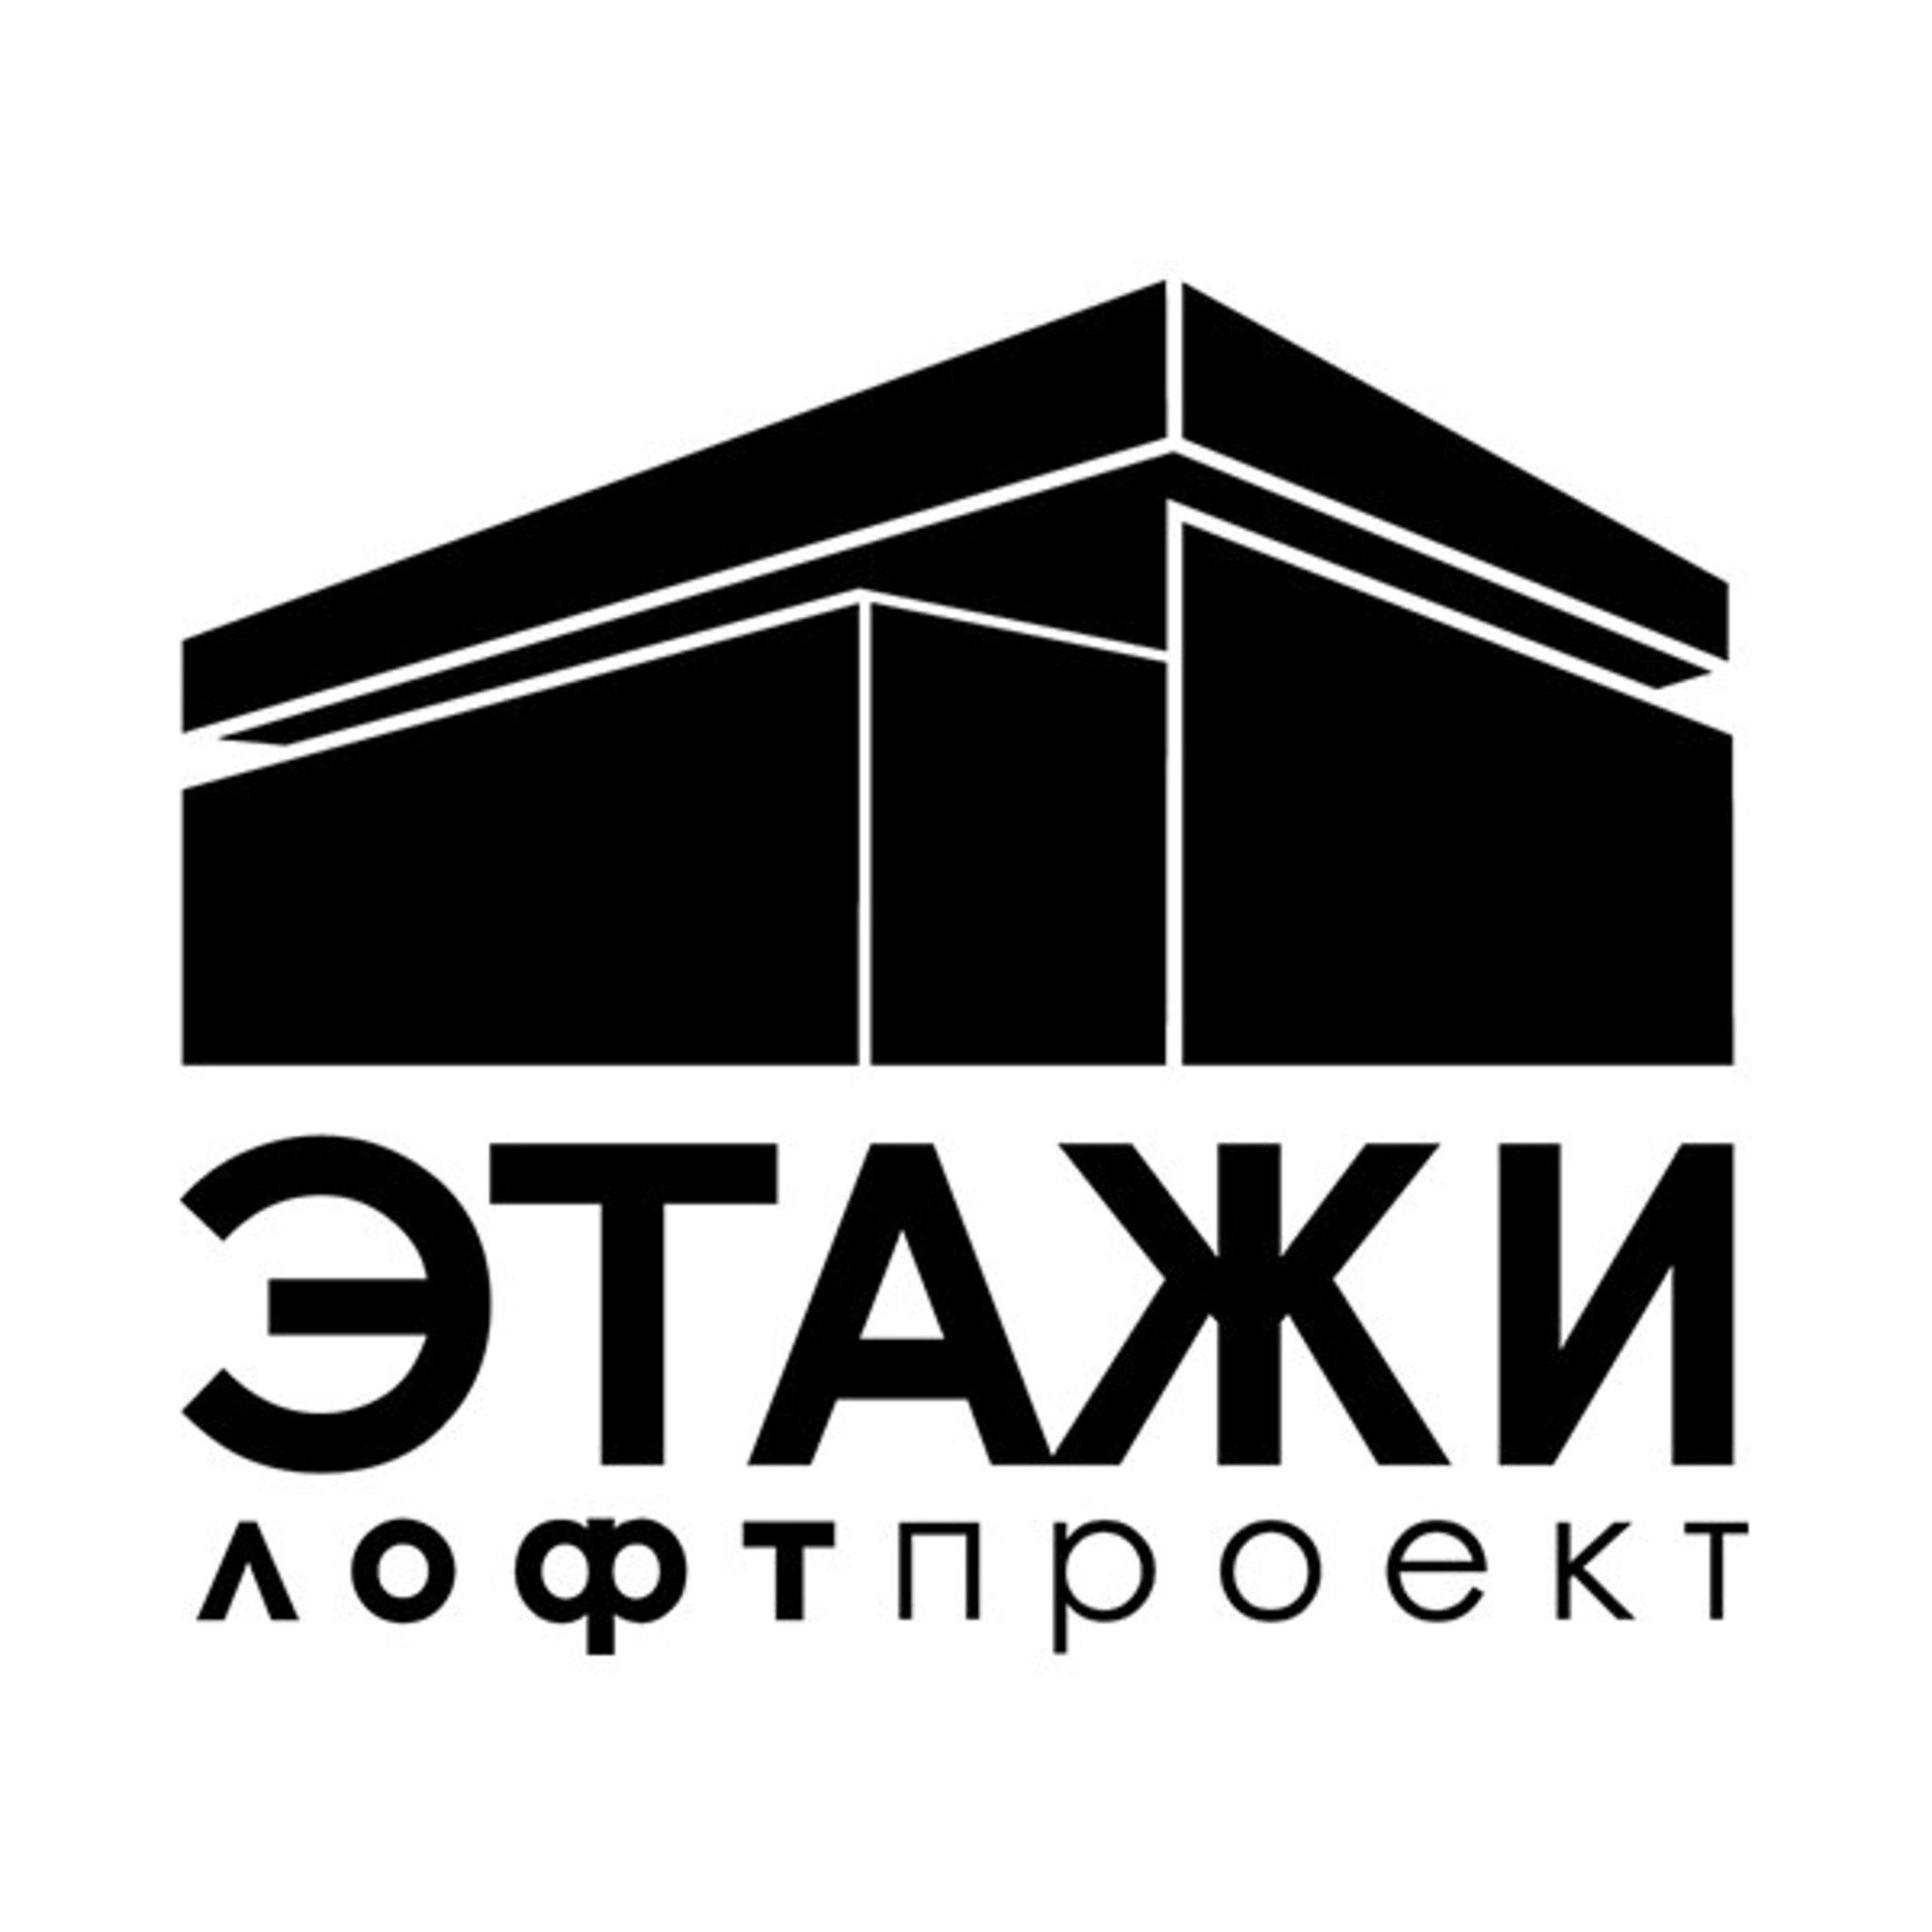 Loft Project ETAGI